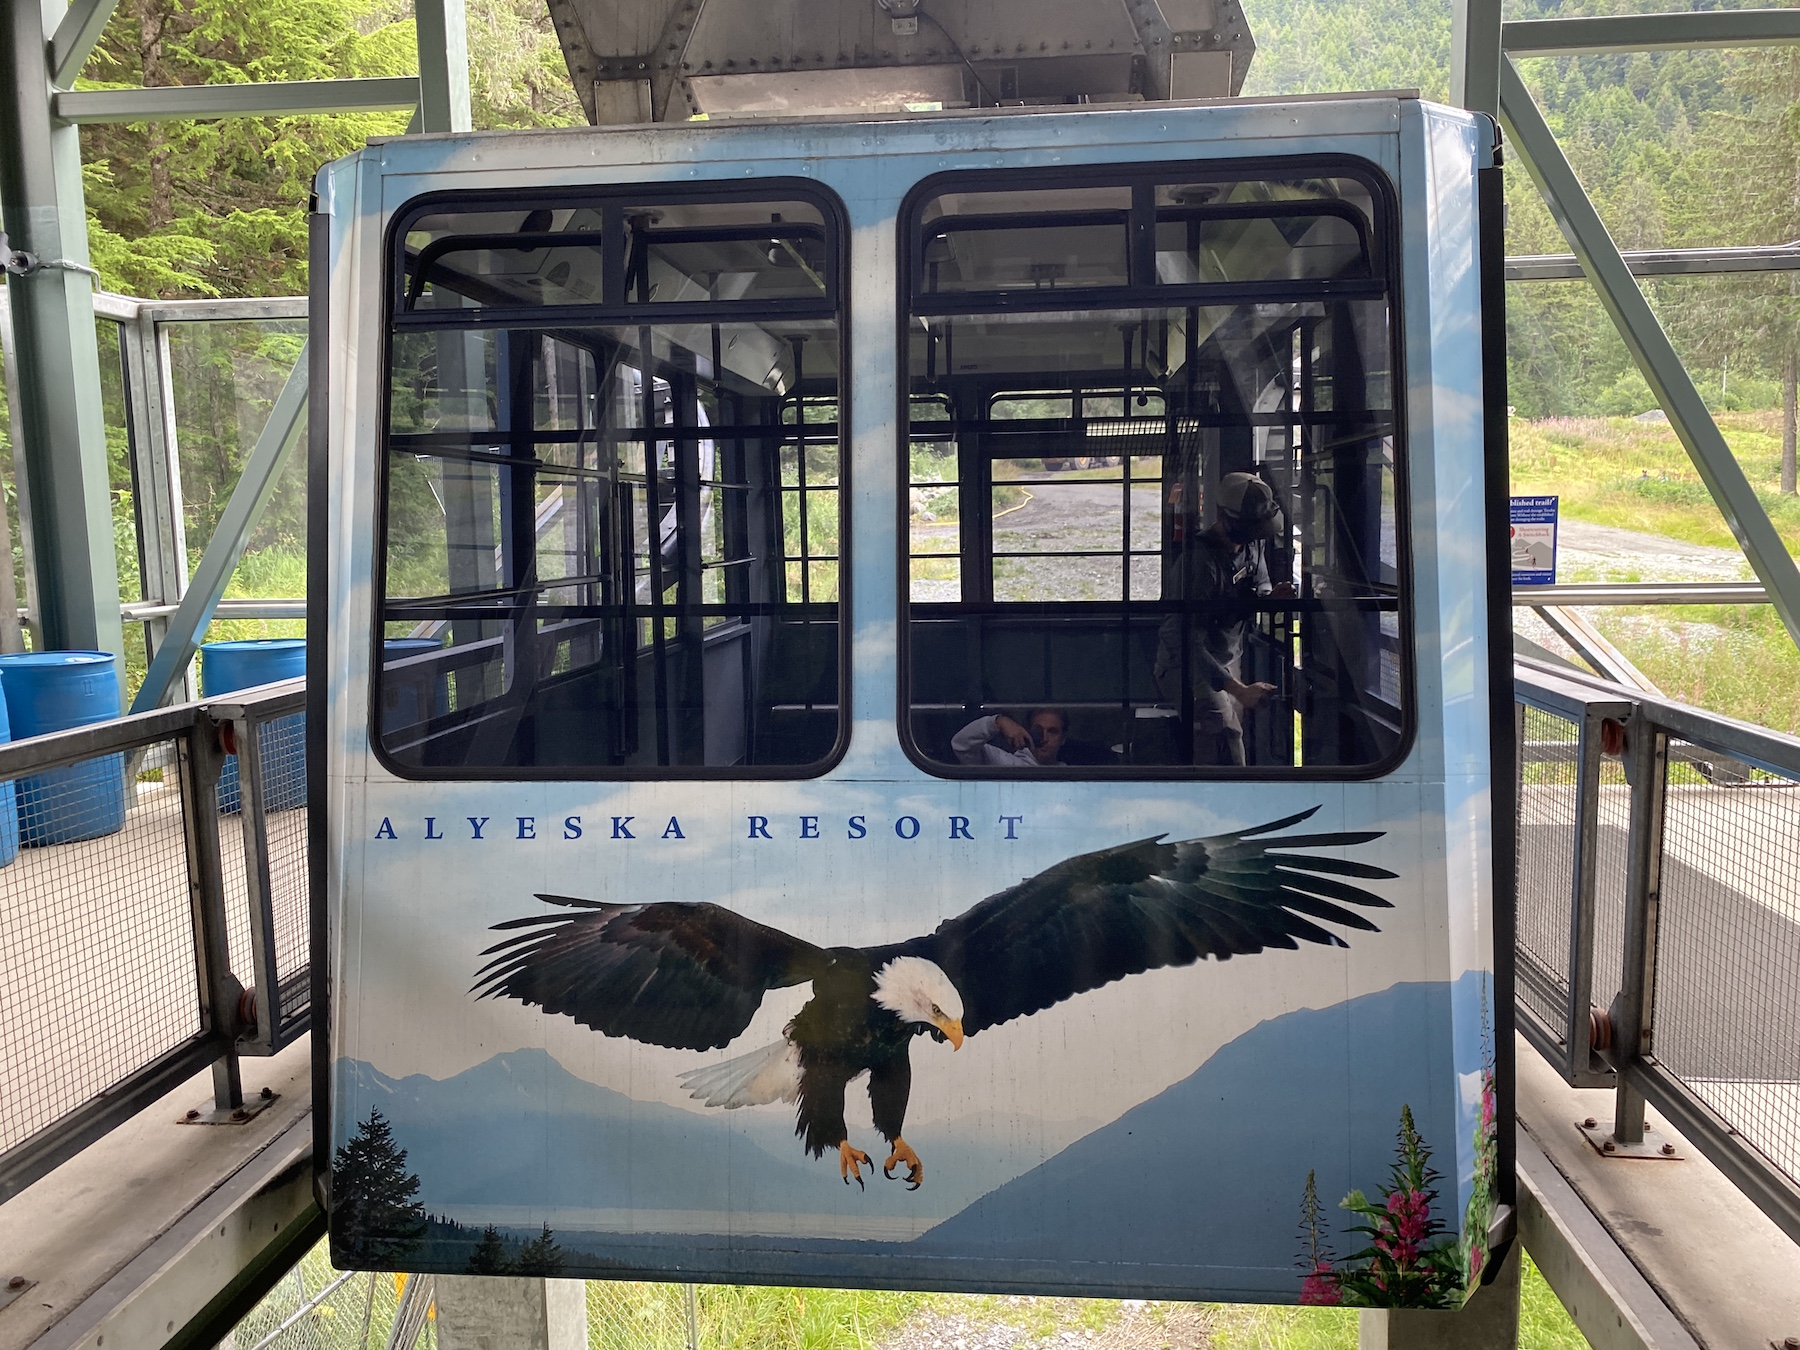 Ayleska Aerial Tram